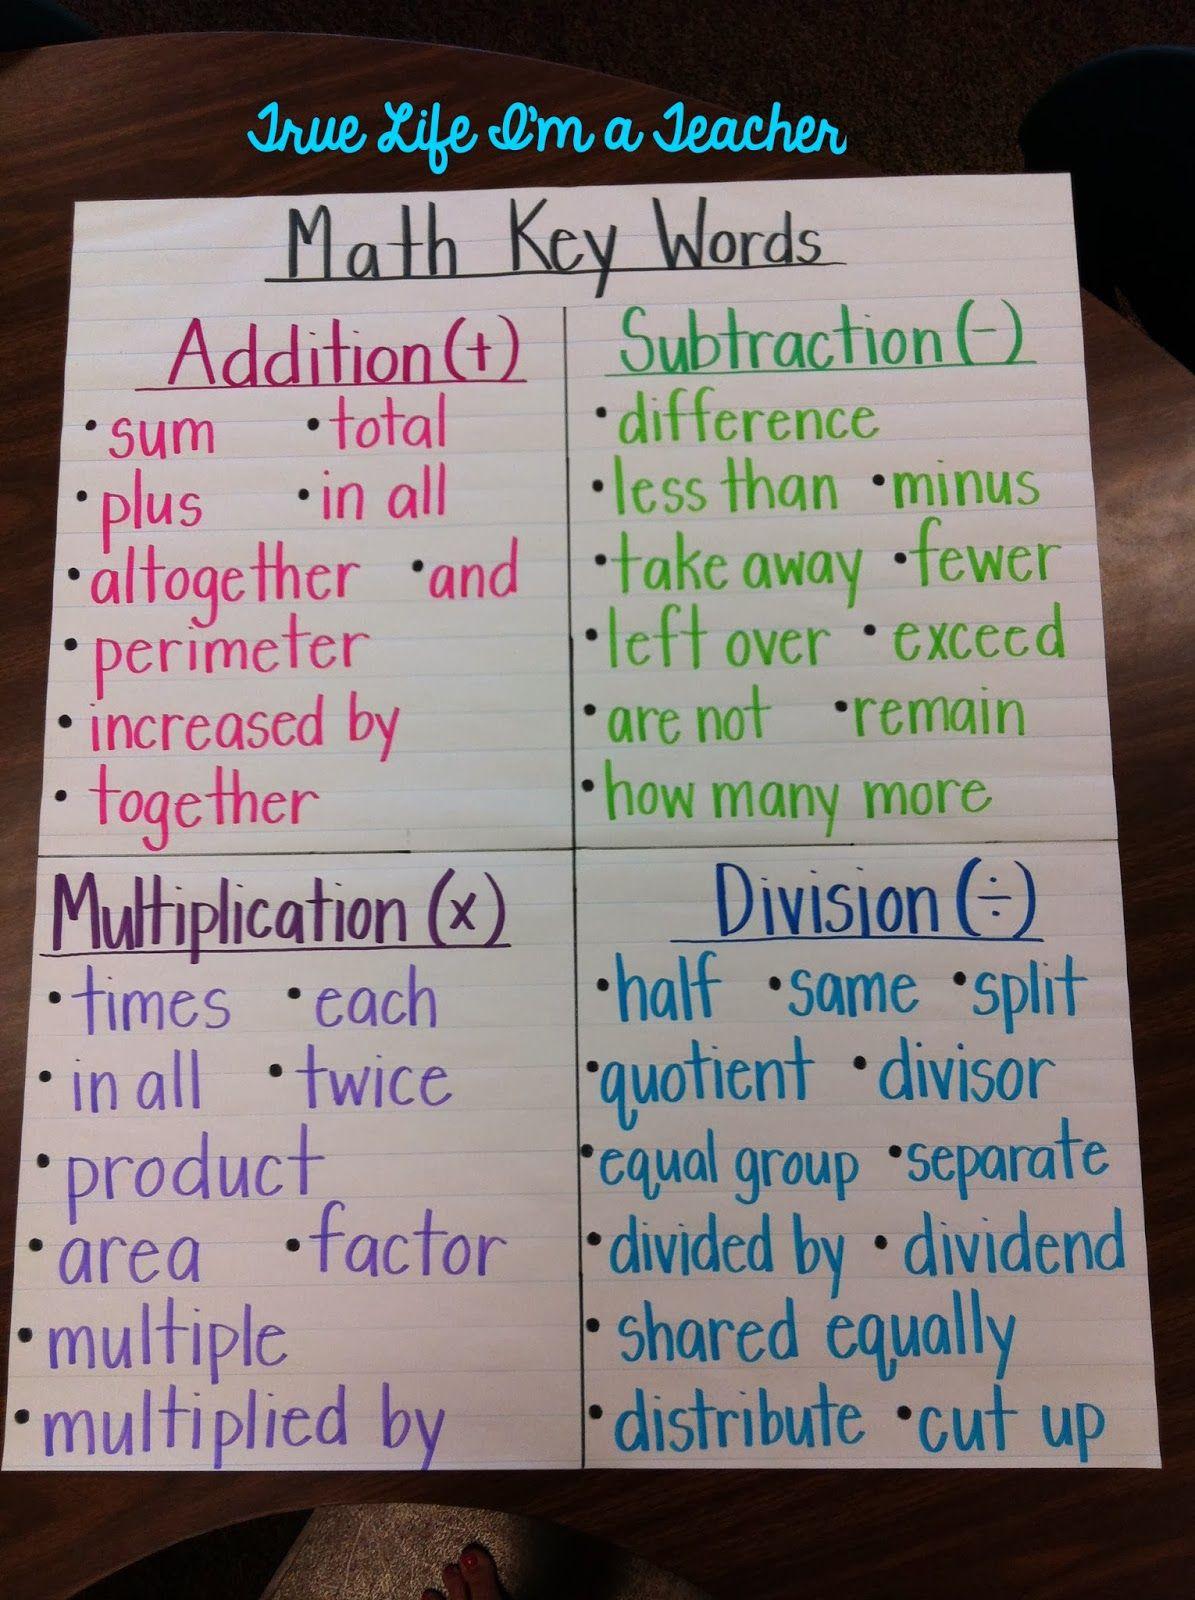 Math Key Words Anchor Chart Addition Key Words Subtraction Key Words Multiplication Key Words Division Key Wor Math Key Words Math Words Math Anchor Charts